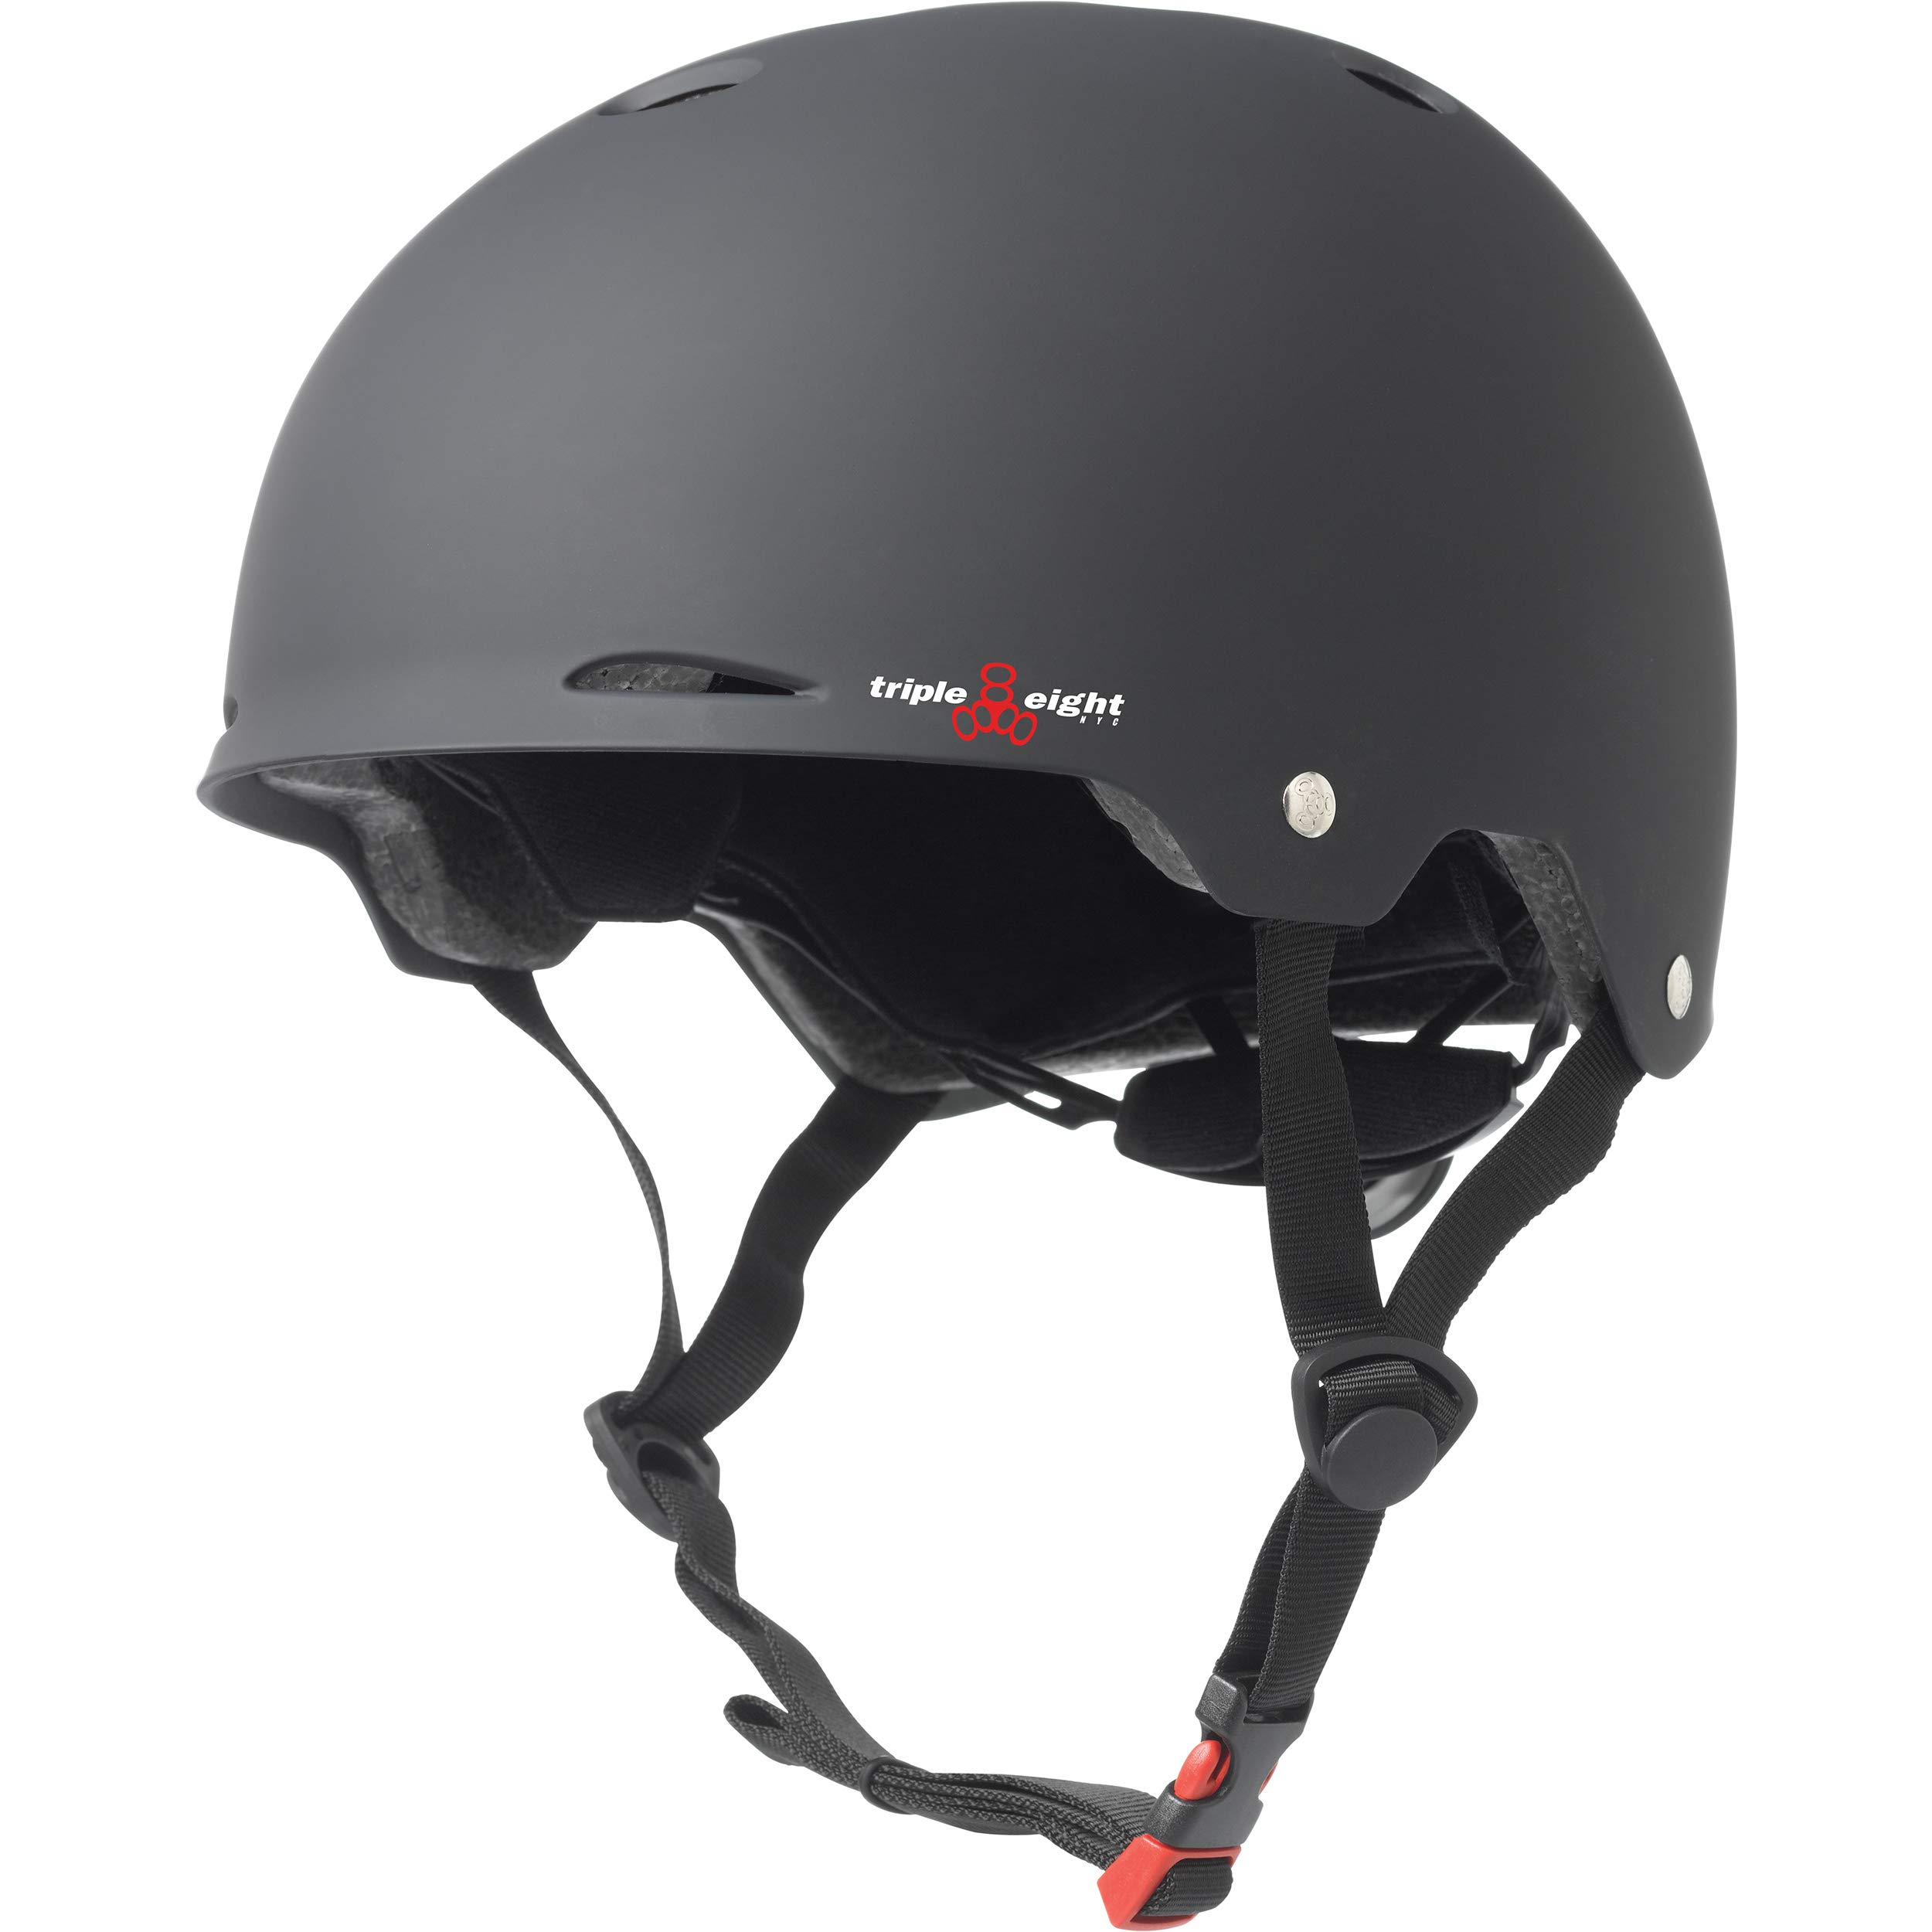 Triple Eight Gotham Dual Certified Skateboard and Bike Helmet, Black Matte, Large / X-Large by Triple Eight